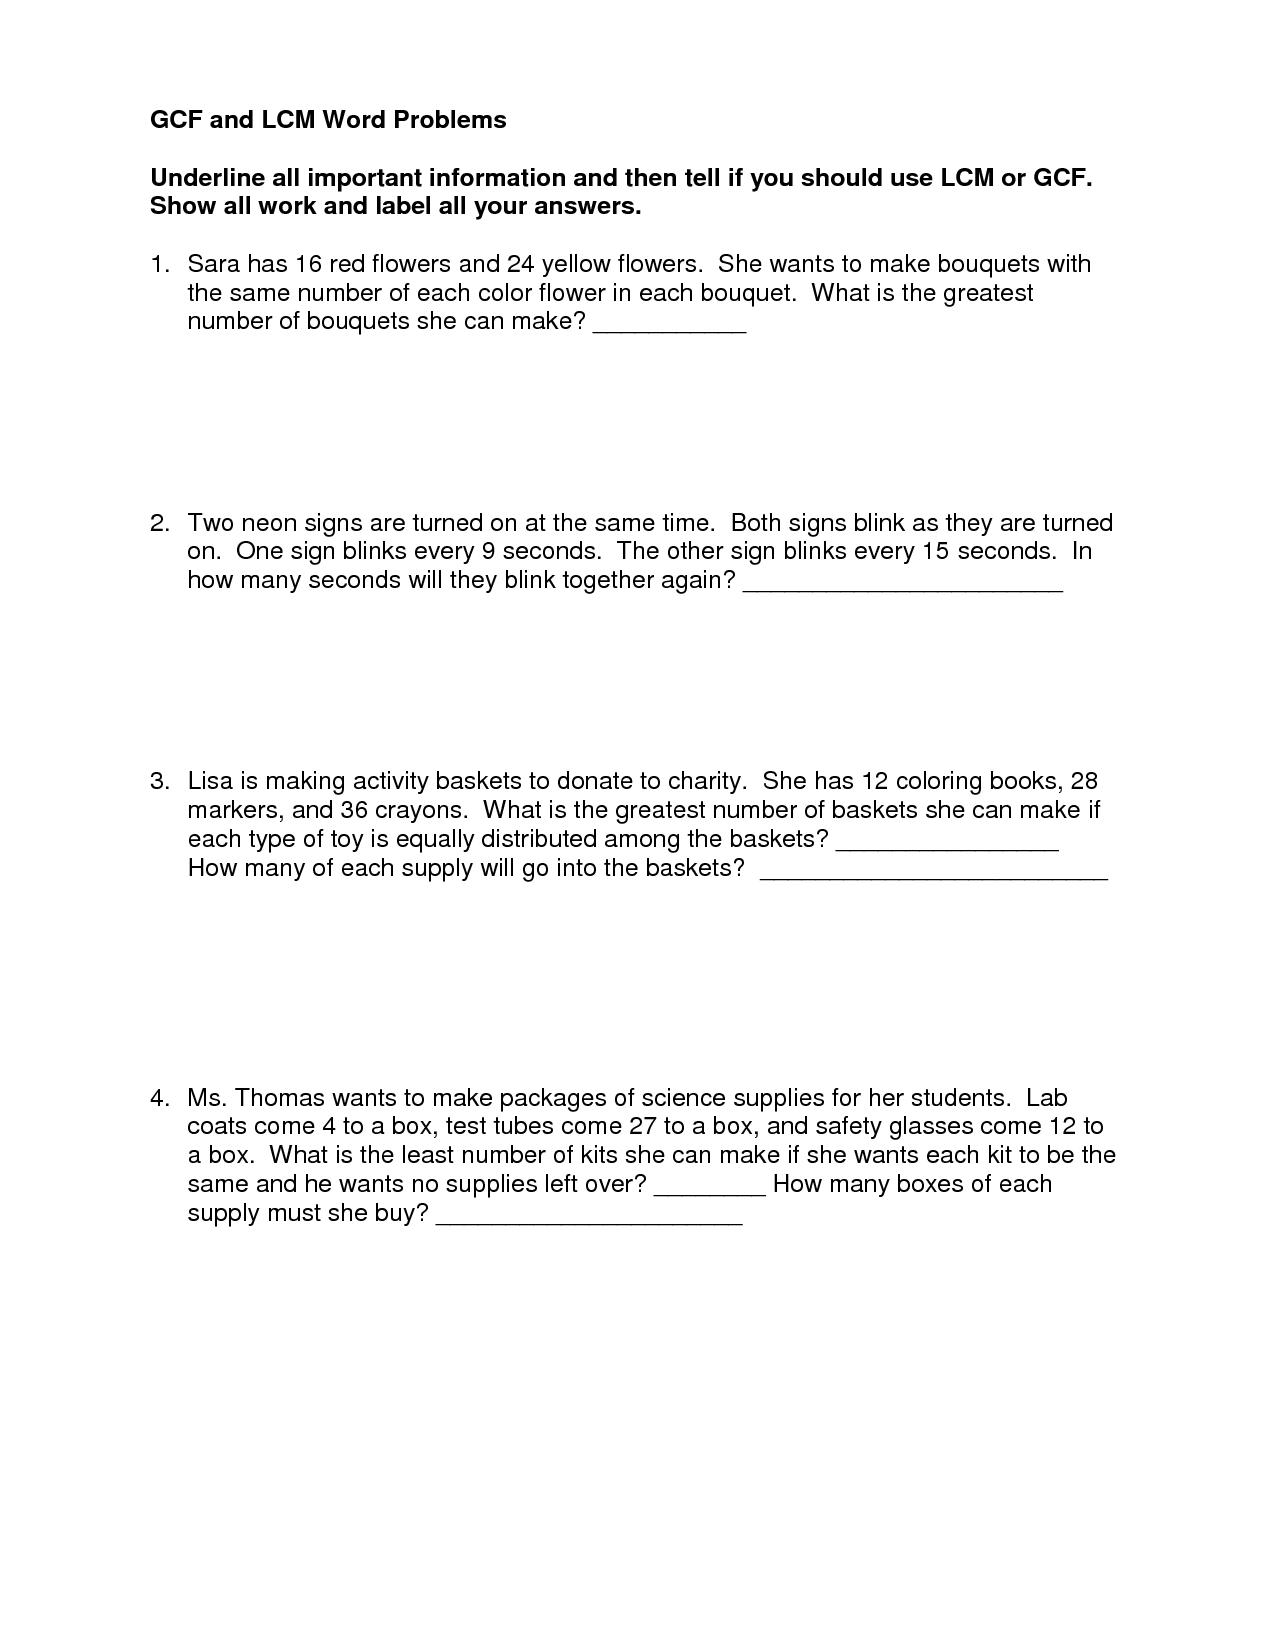 Worksheet On Lcm And Gcf